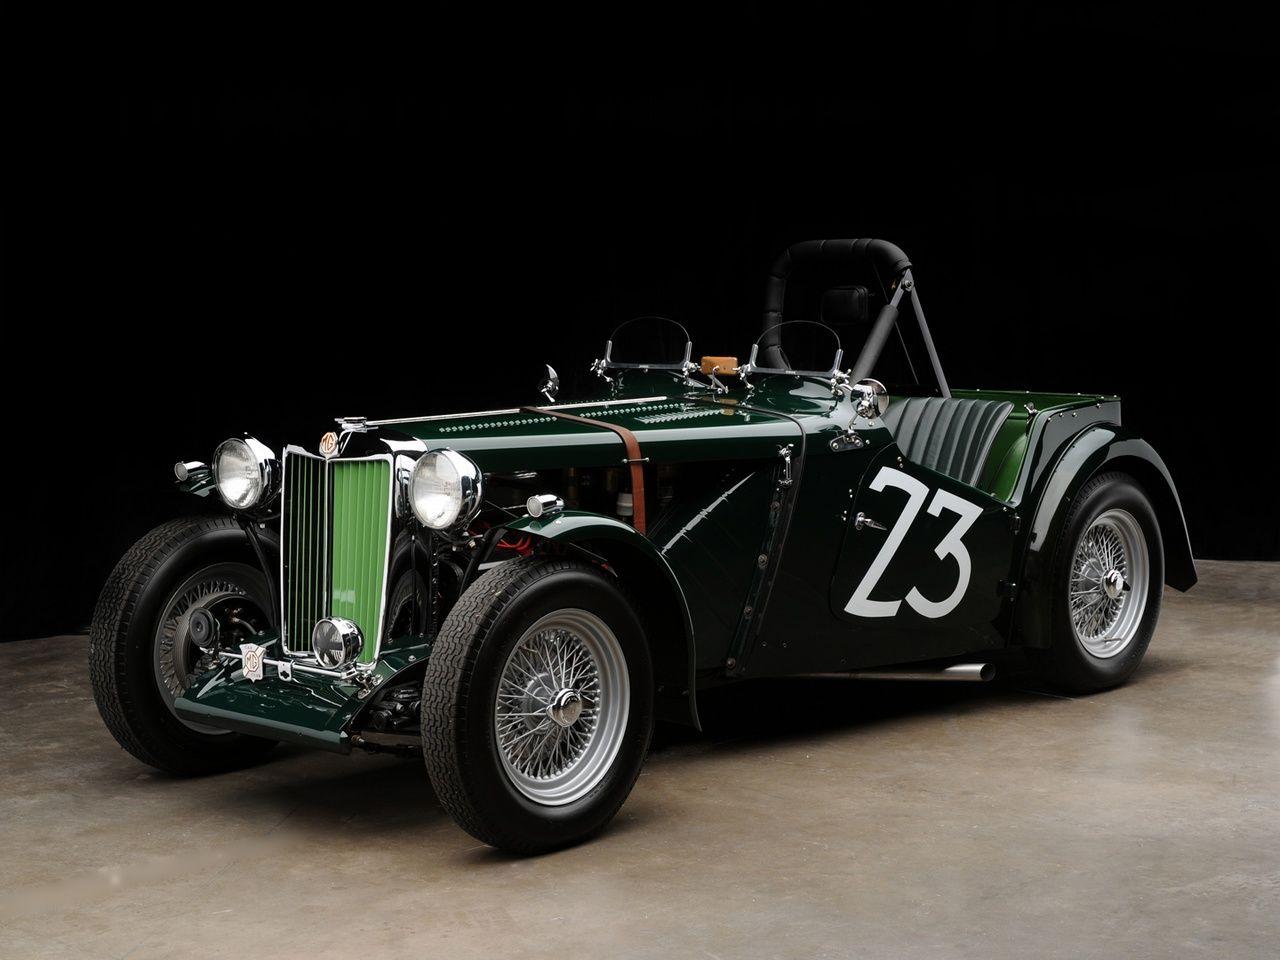 1949 MG TC Race Car | Sportscars and racing junk | Pinterest ...